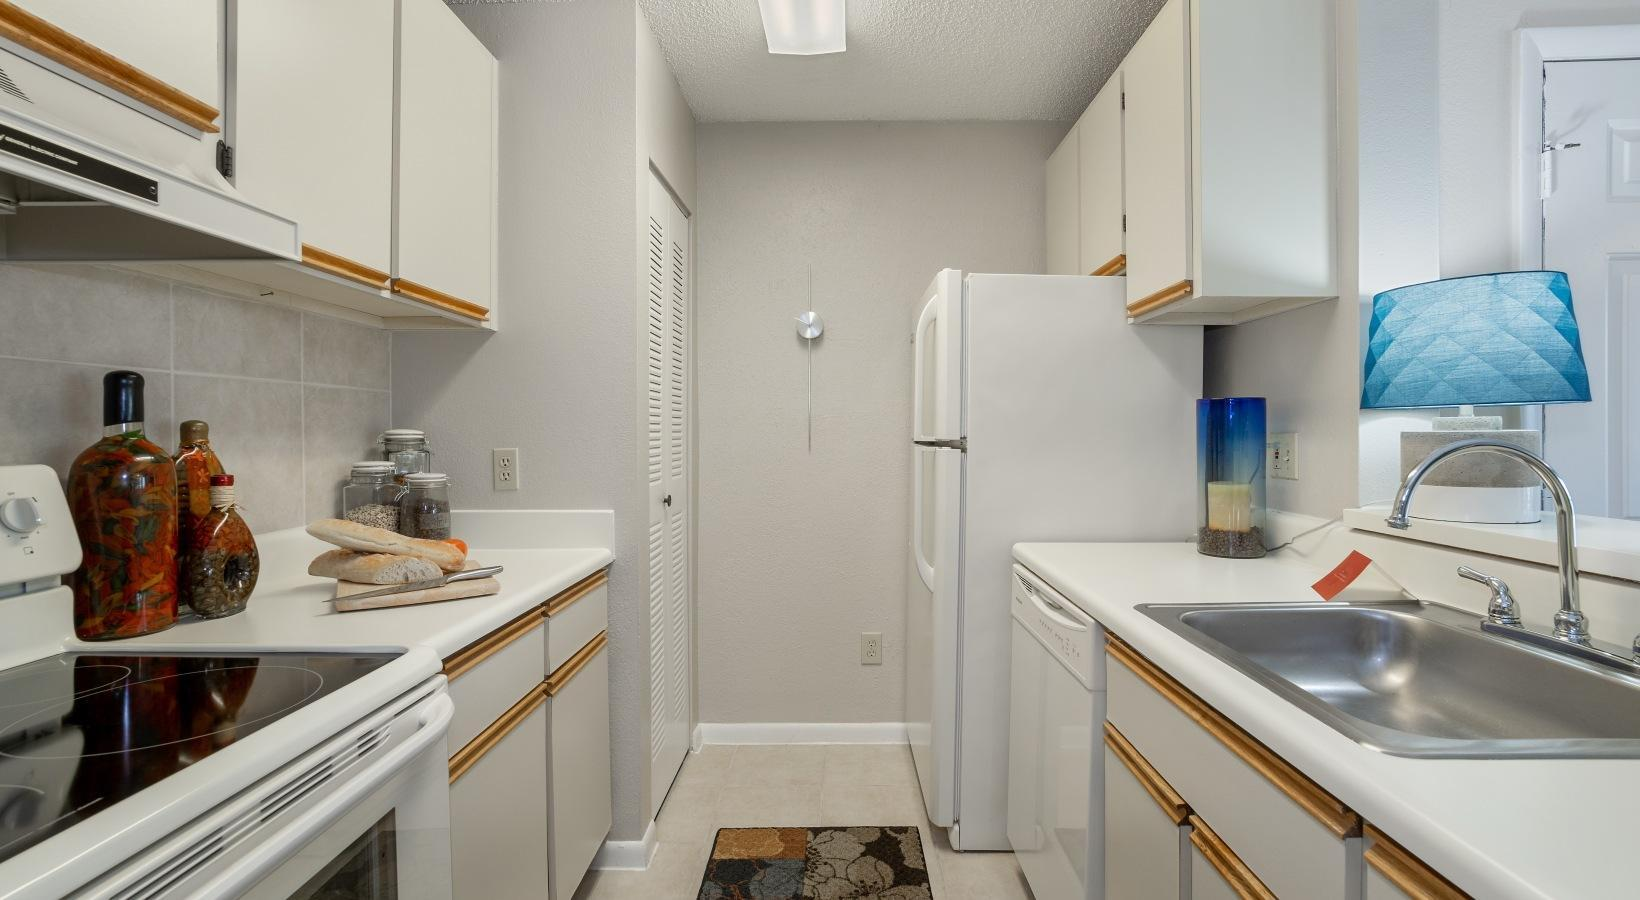 520 Terraceview Cove #16-102, Altamonte Springs, FL - 1,452 USD/ month